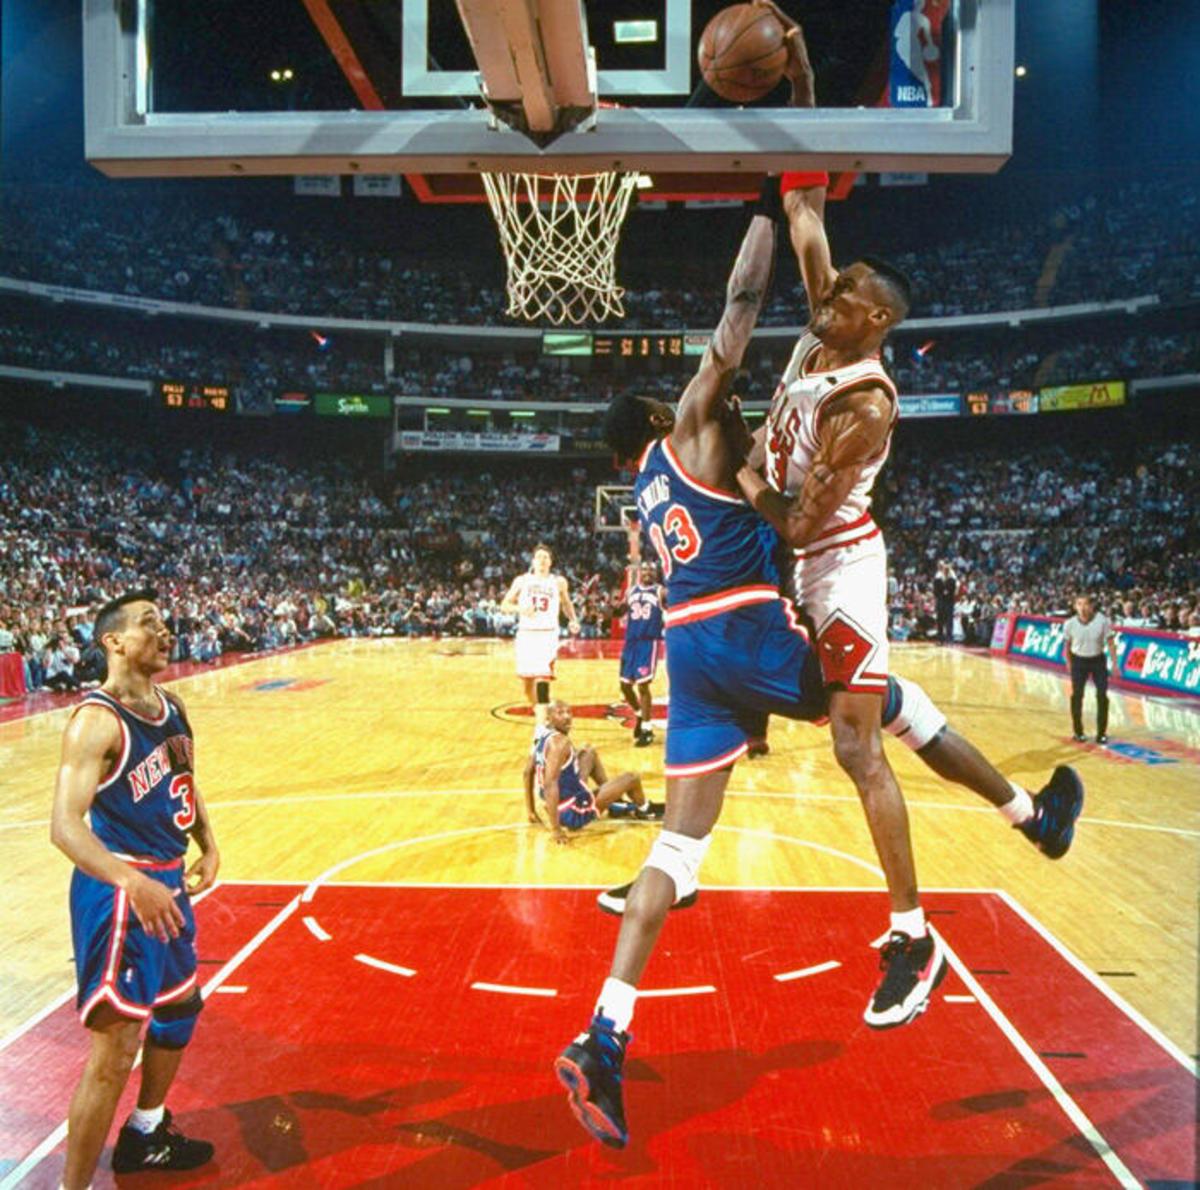 Scottie Pippen posterizes Knicks legend Patrick Ewing.